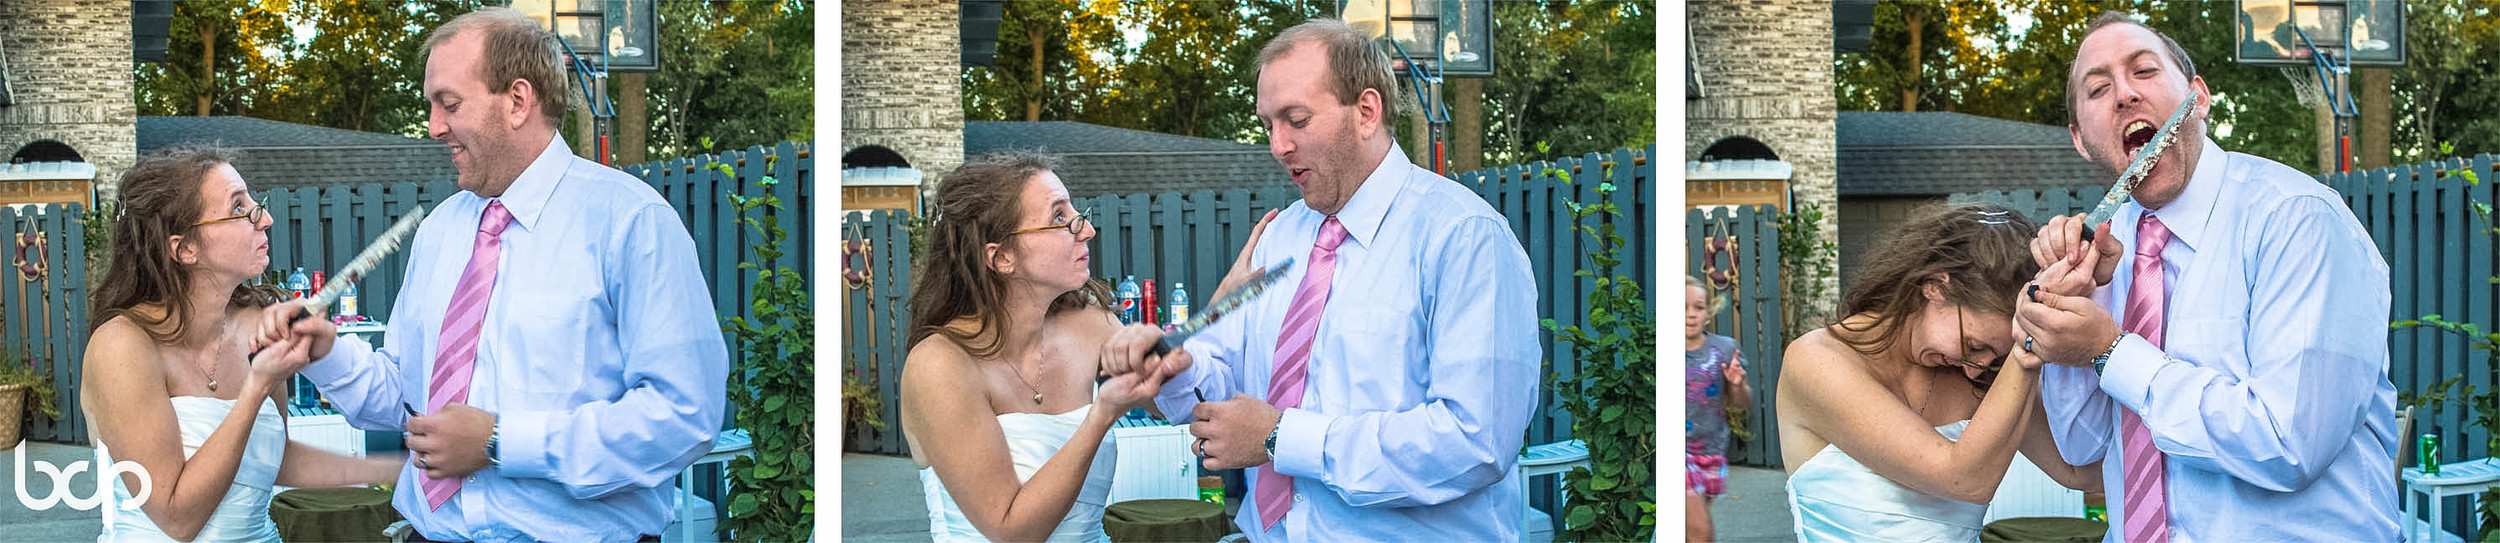 Scott and Rena's Wedding 090812 BDP SQ-24.jpg